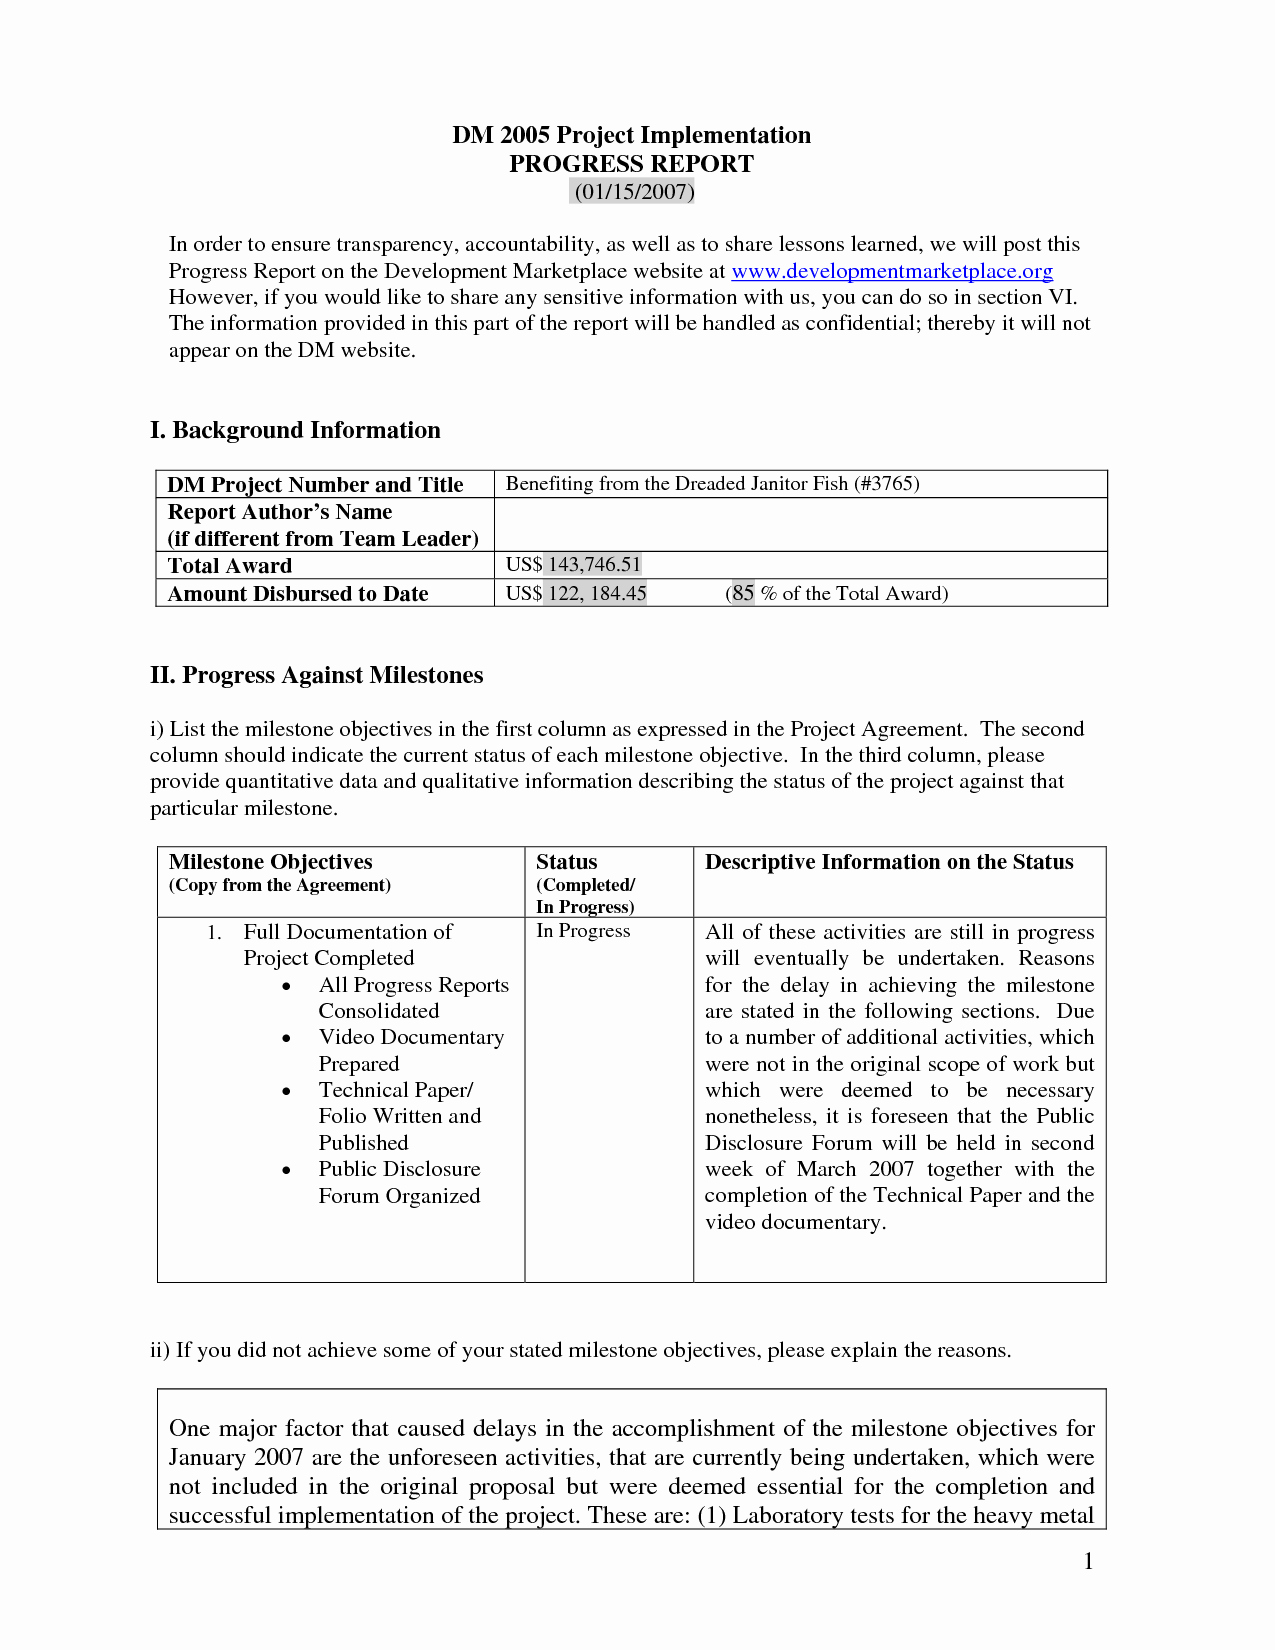 Janitor Job Objective Resume Sidemcicek